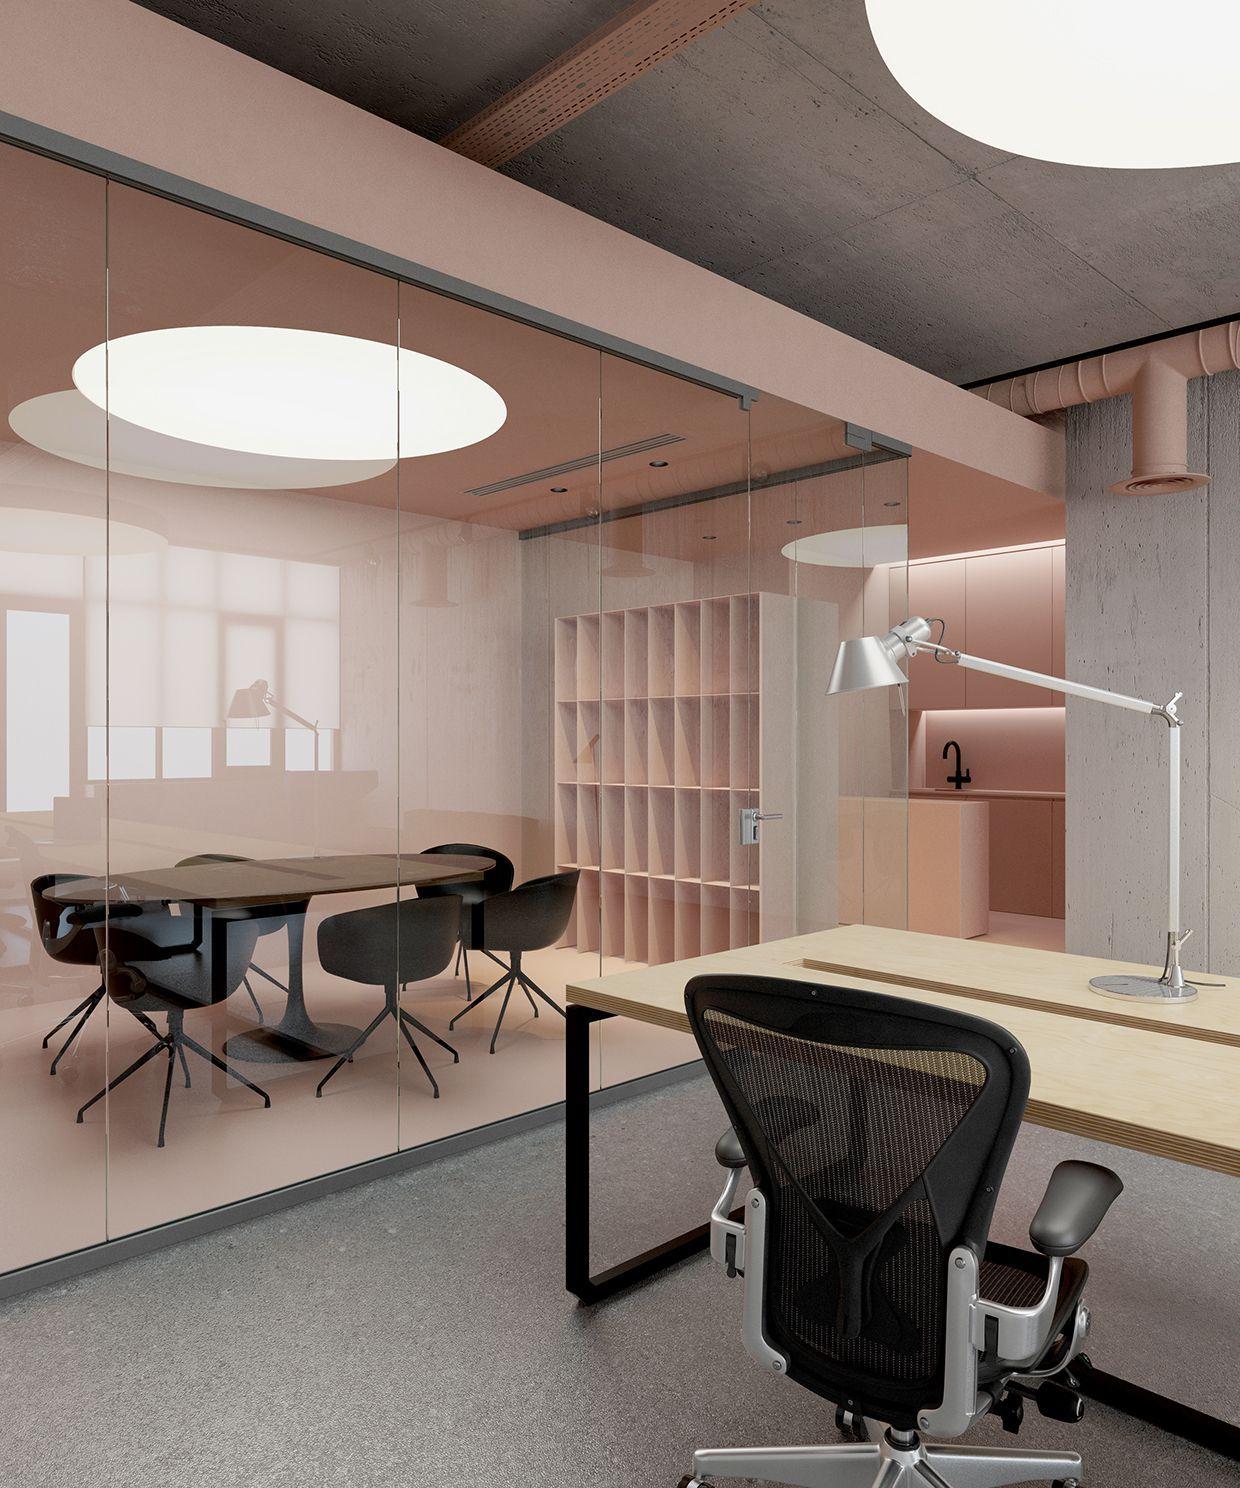 15 creative business office design ideas for men architecture rh pinterest com